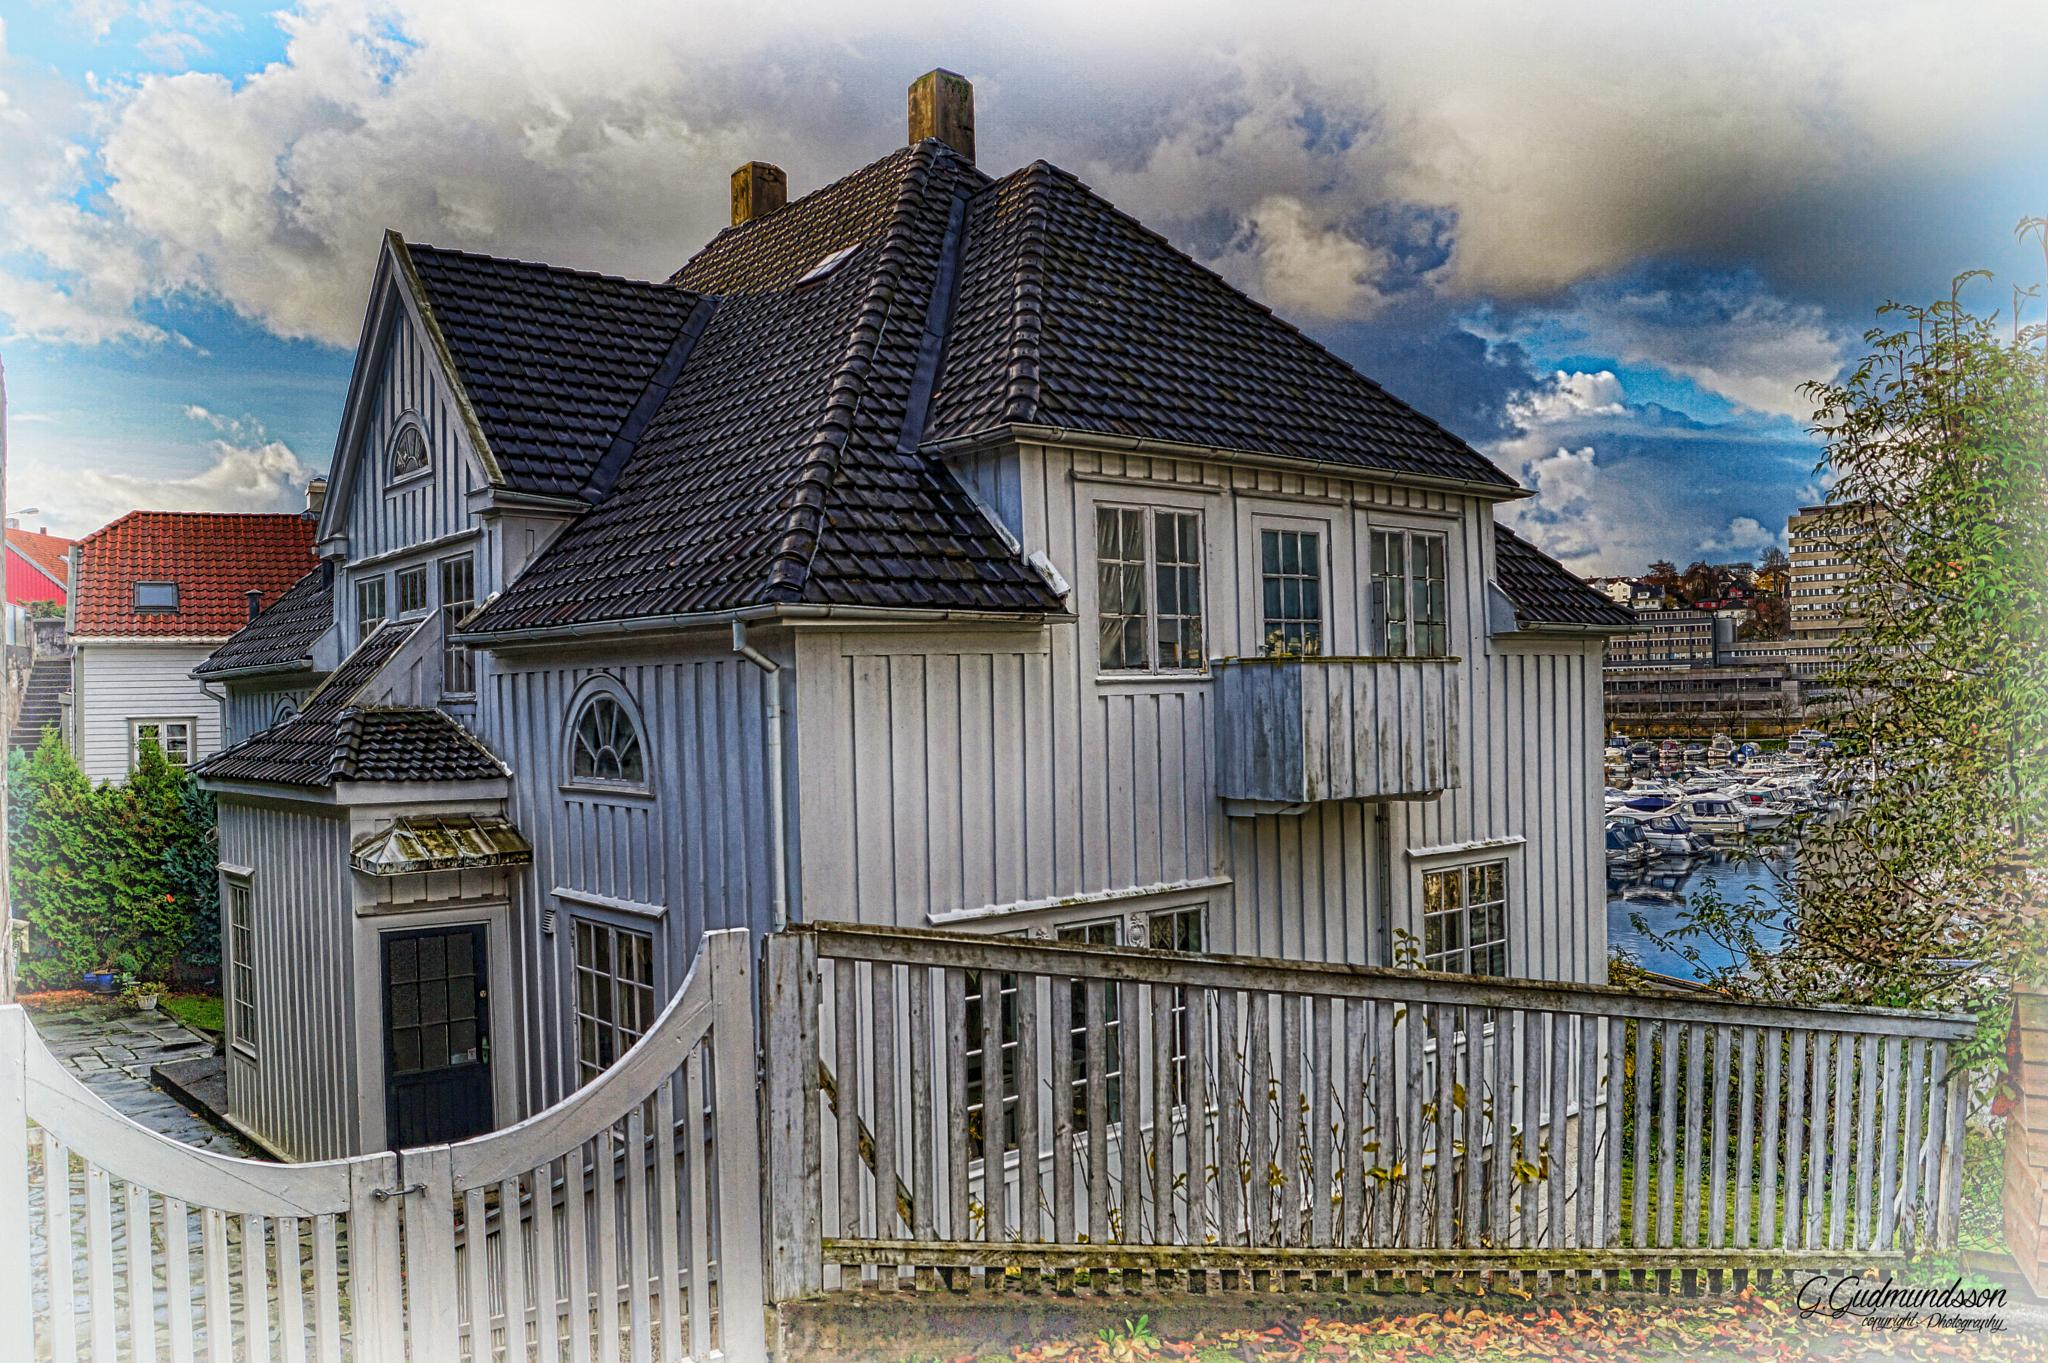 Stavanger Norway by gudlaugurgudmundsson1